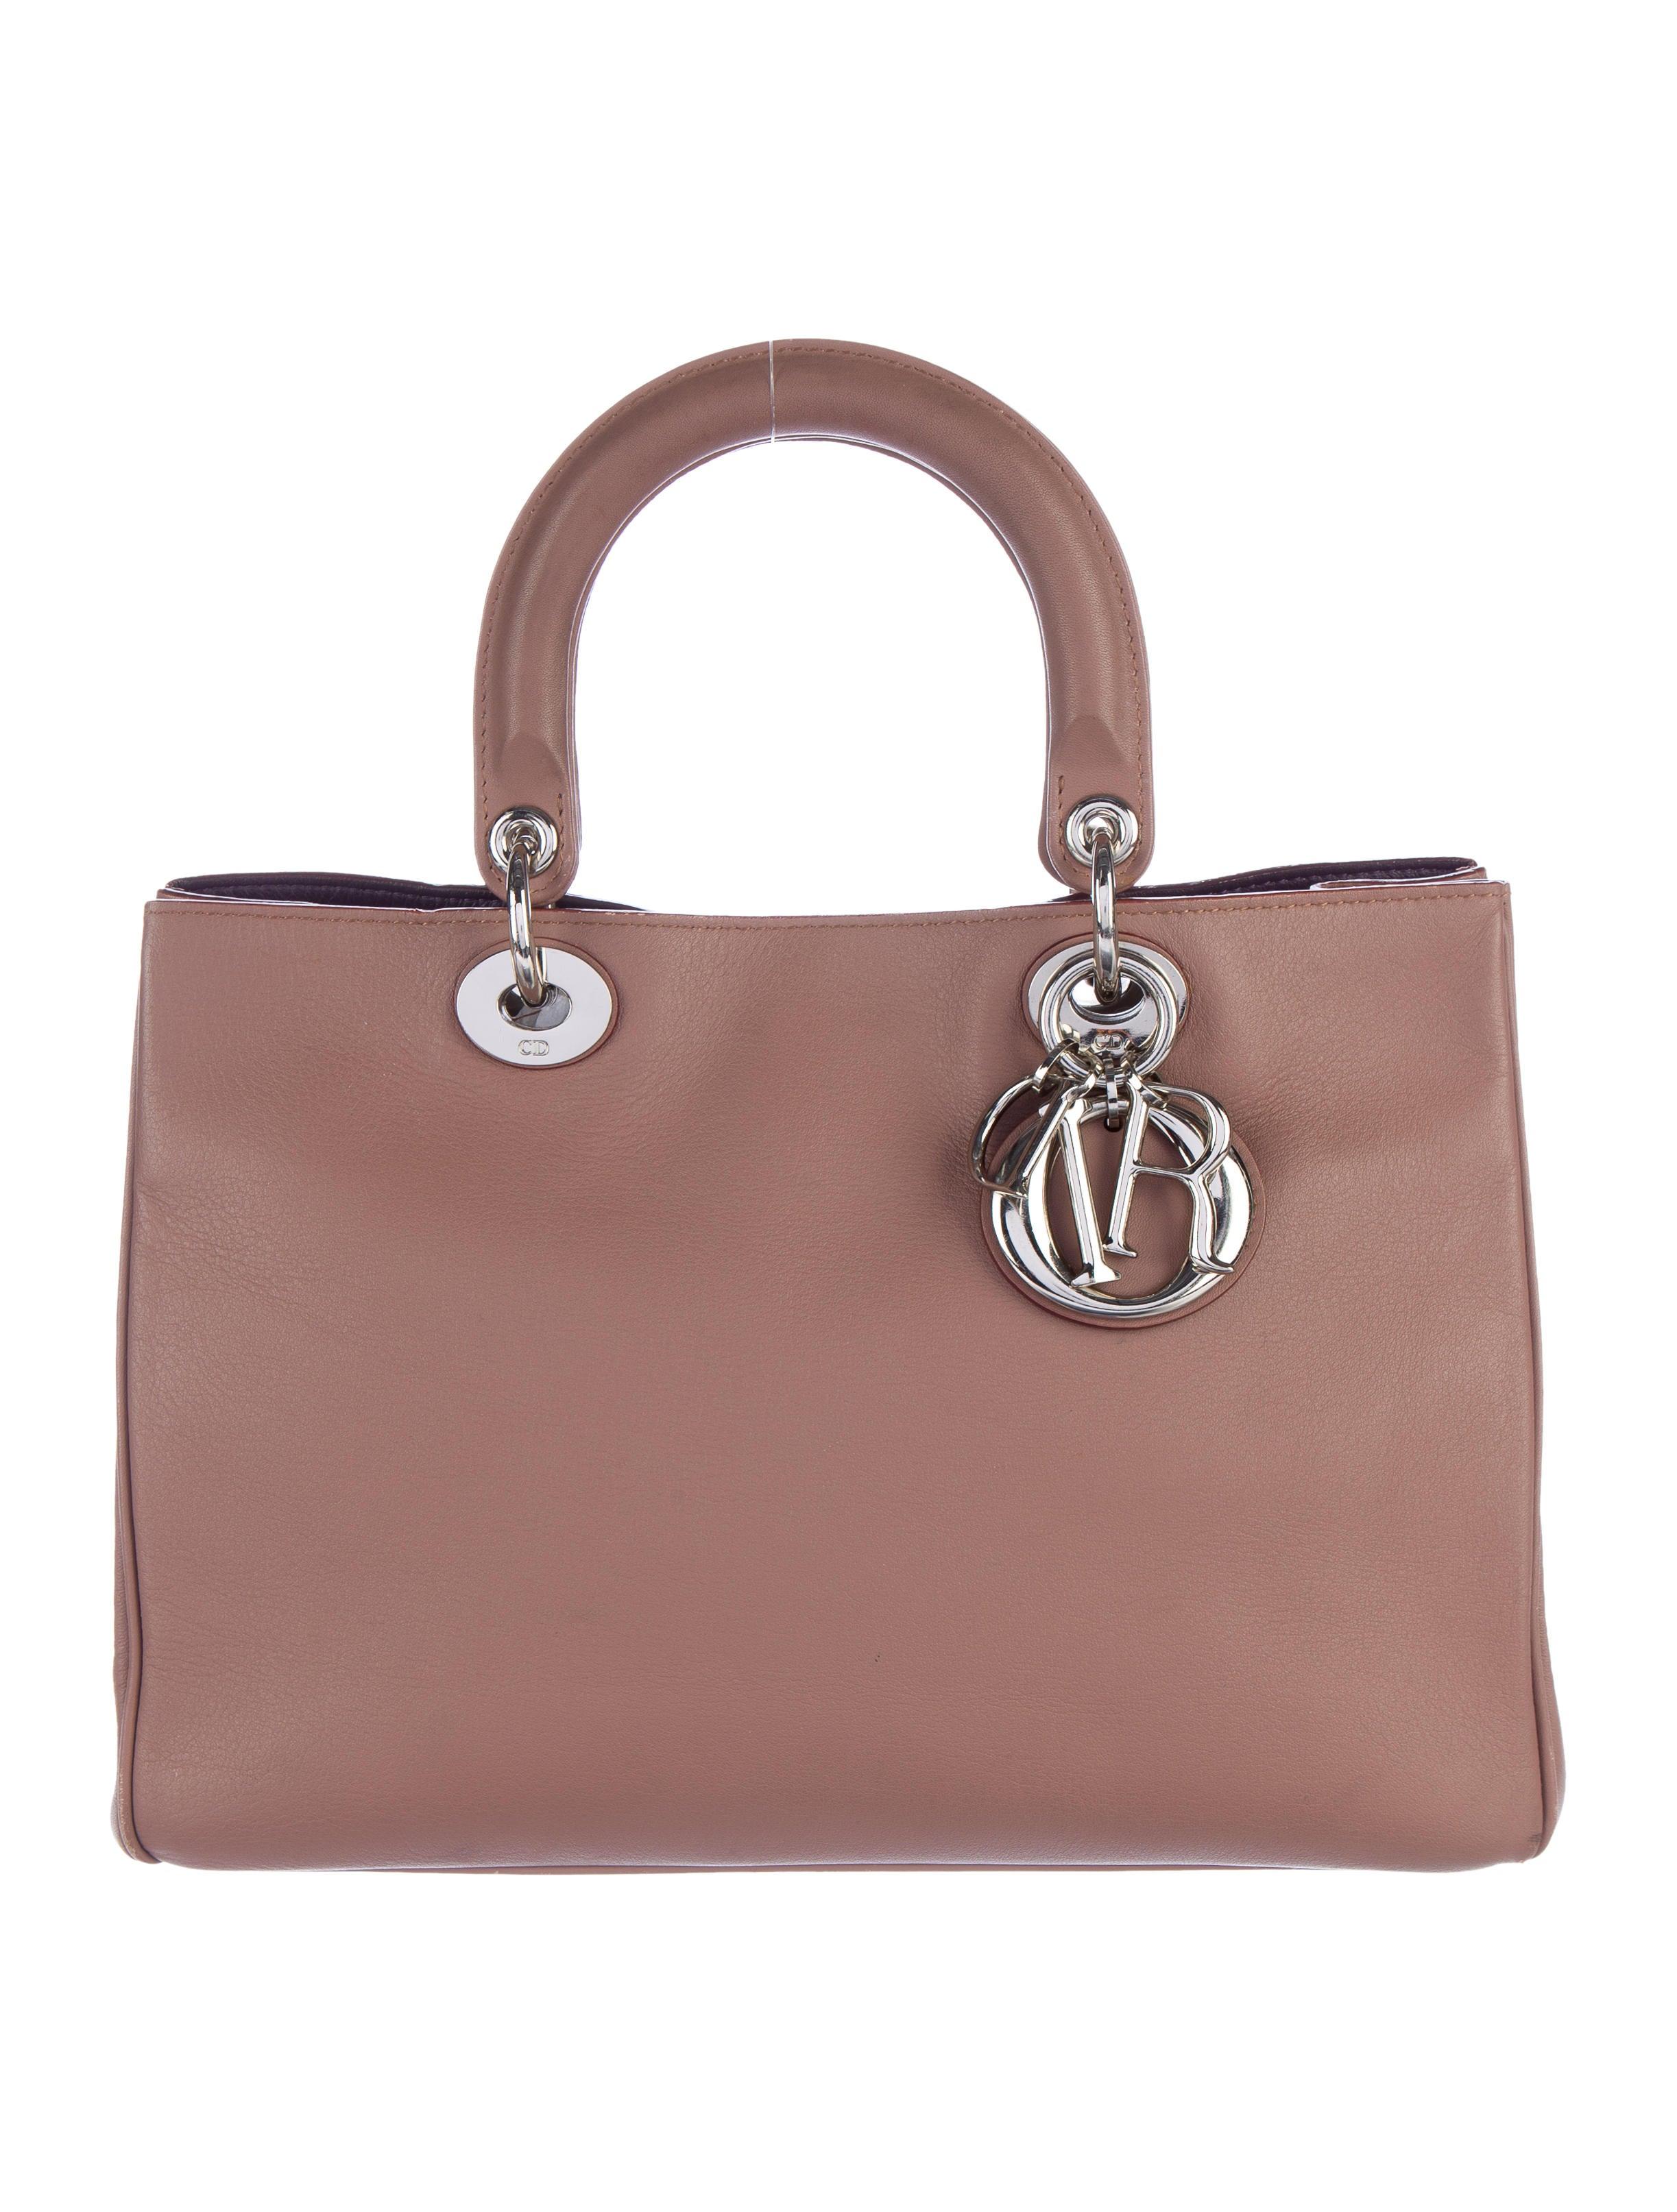 Christian Dior Medium Diorissimo Bag Handbags CHR49861  : CHR498611enlarged from www.therealreal.com size 2446 x 3227 jpeg 548kB